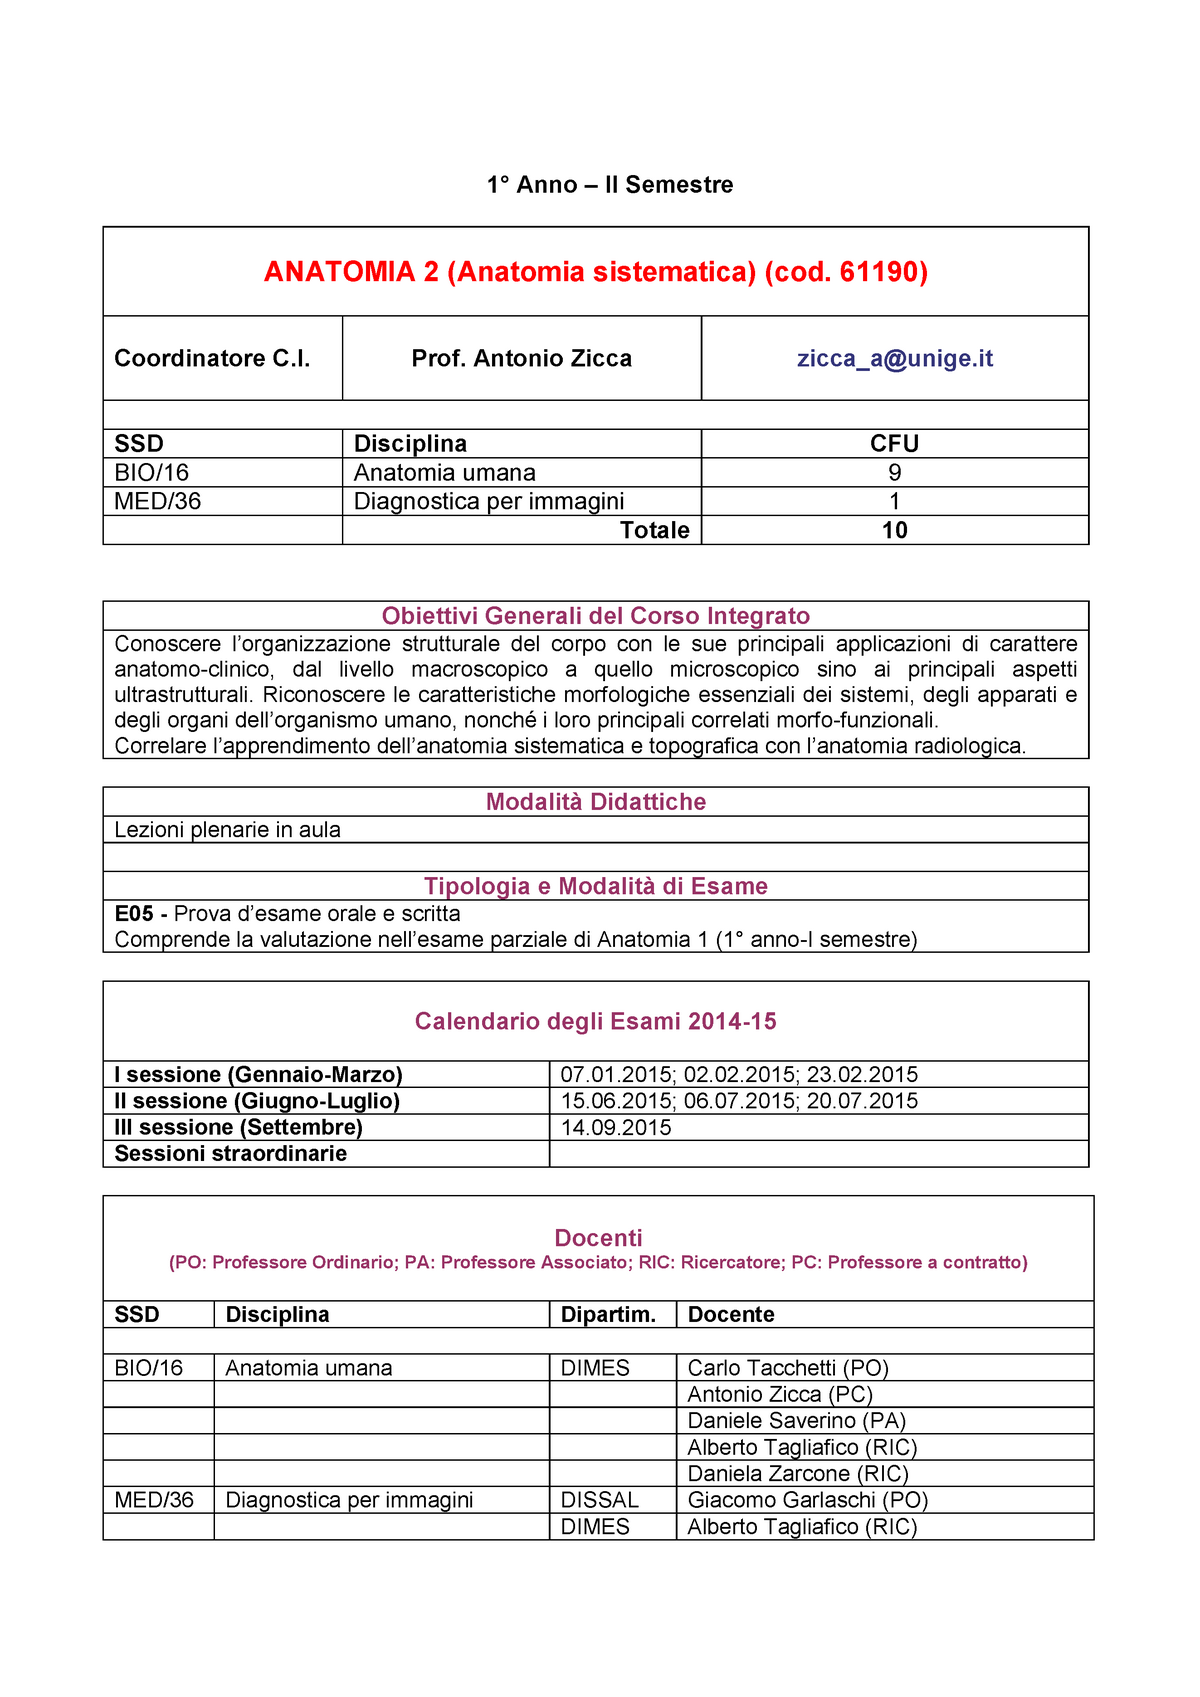 Calendario Medicina Unige.Anatomia 2 58164 Unige Studocu